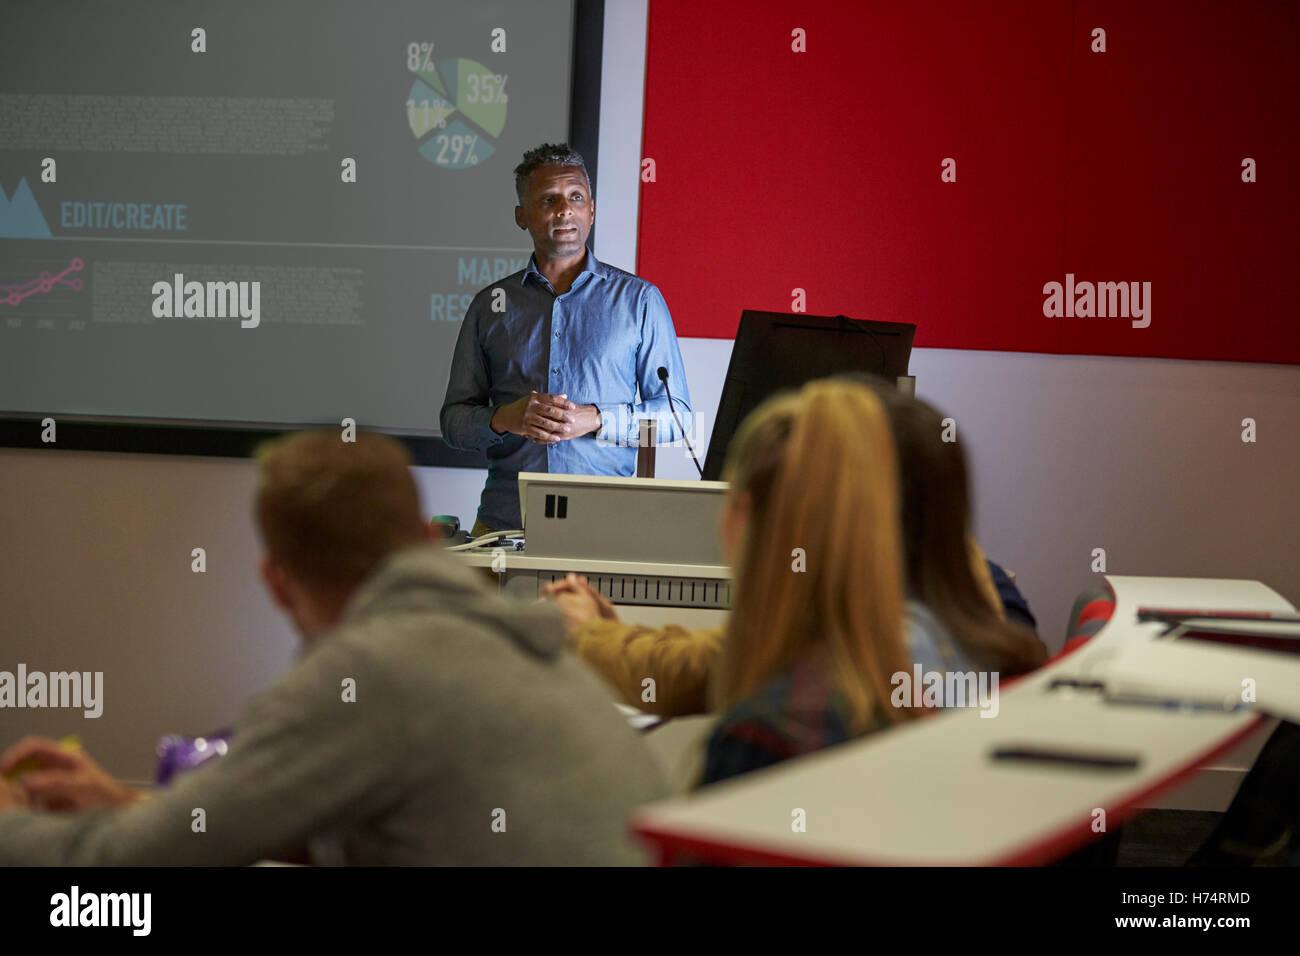 Lecture in a darkened university lecture theatre, student POV - Stock Image